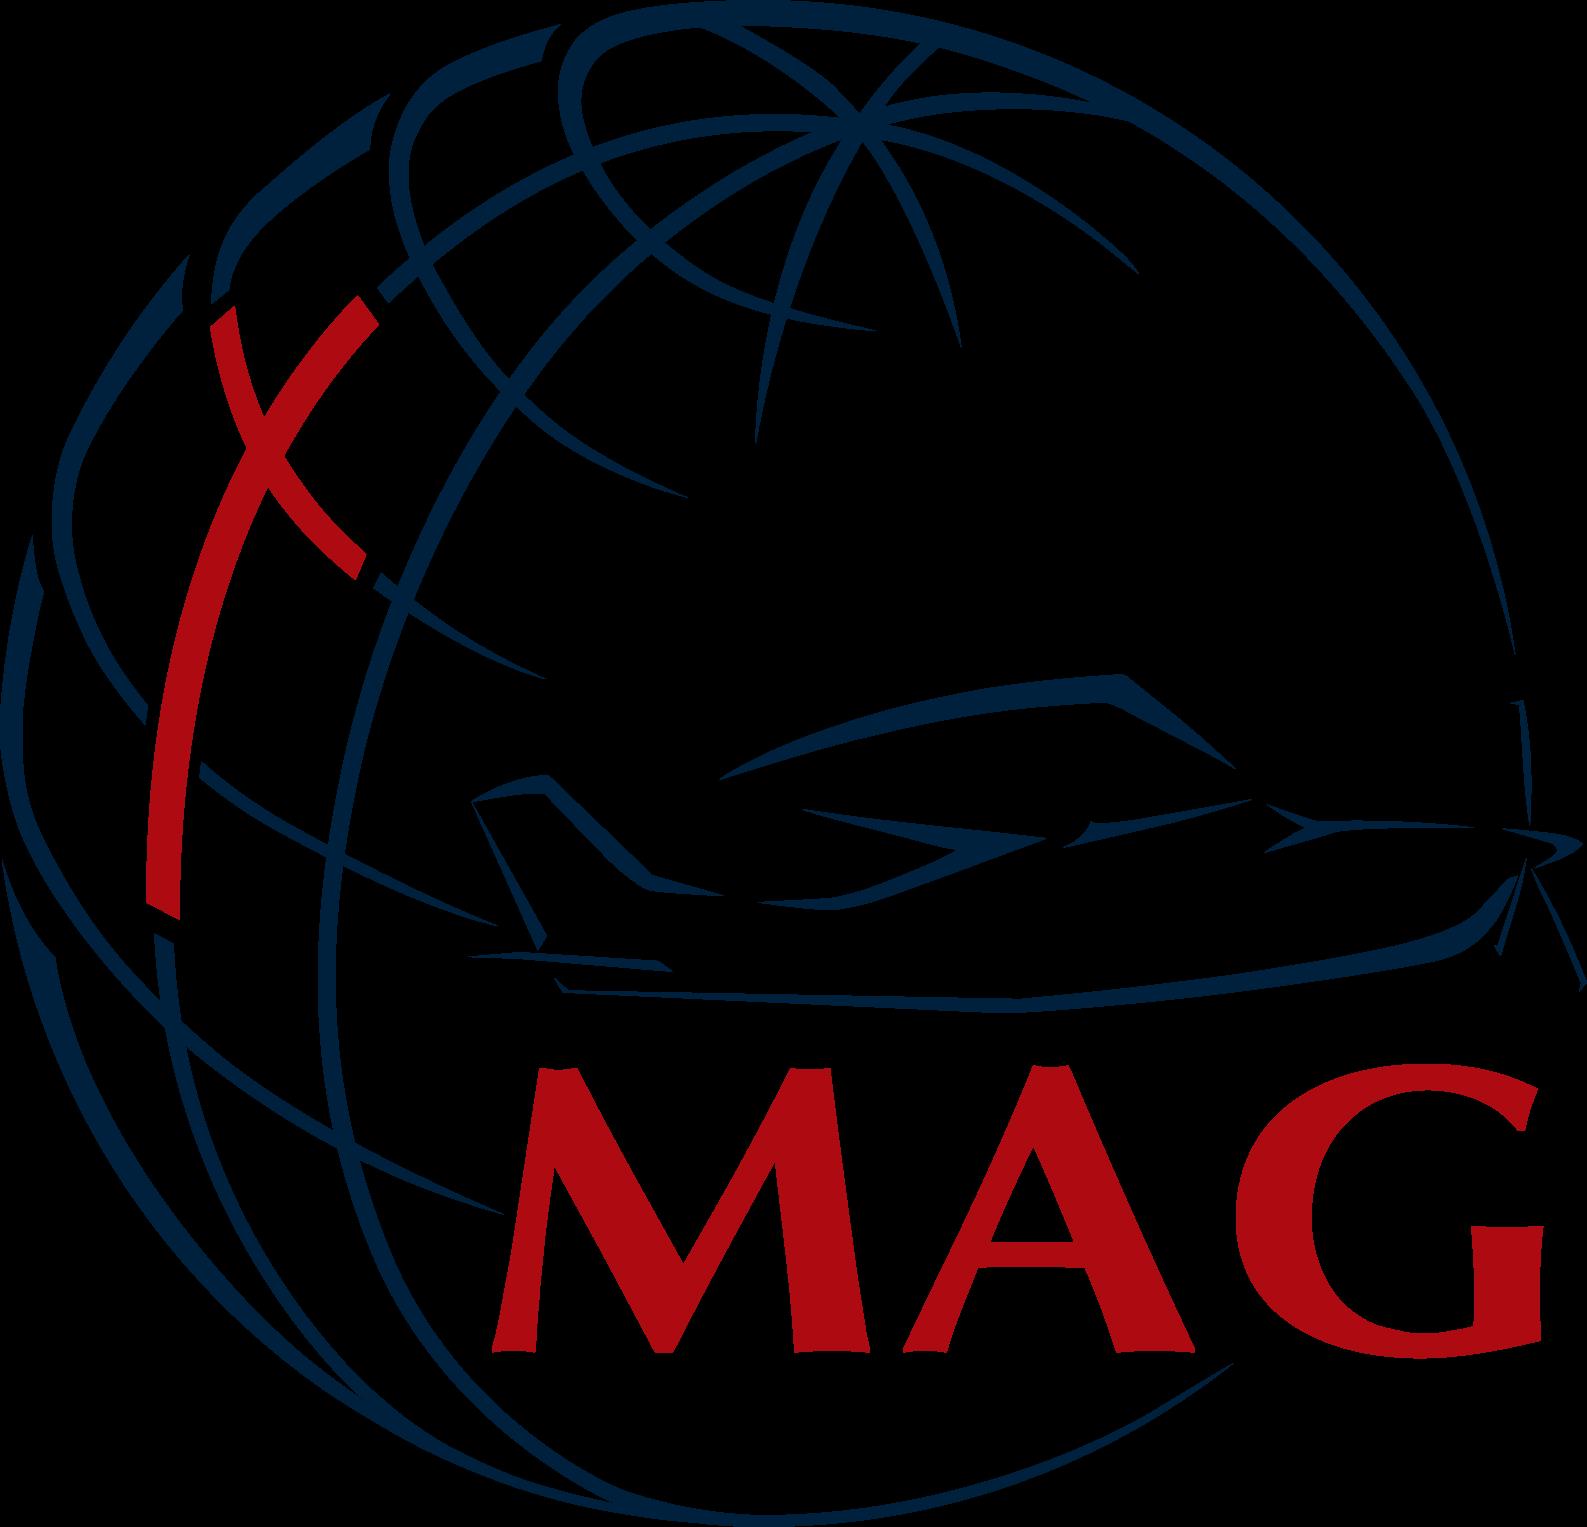 MAGlogoGlobeNew.png